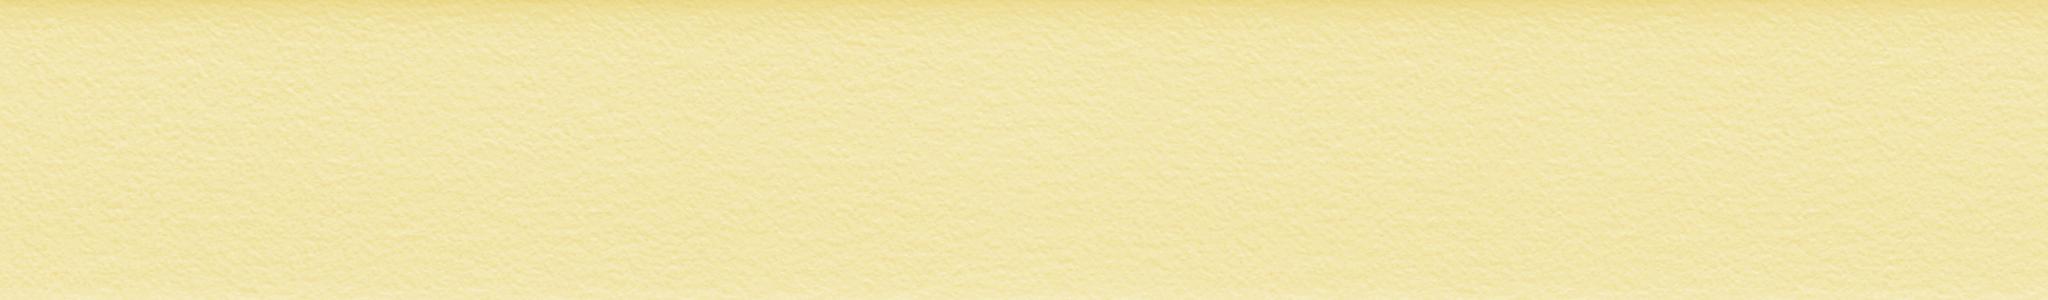 HU 110446 ABS Edge Yellow Soft Pearl 107